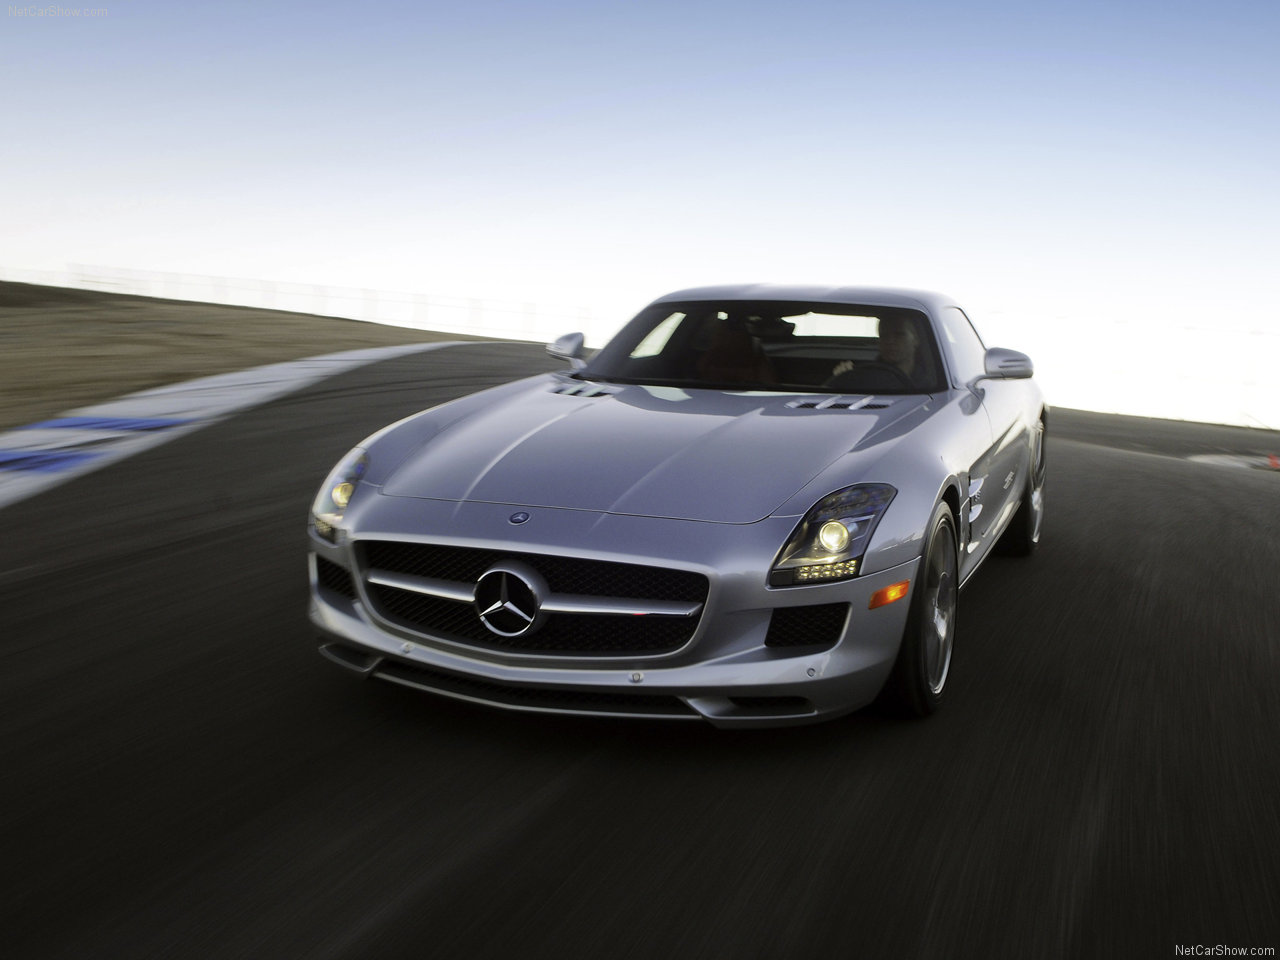 http://3.bp.blogspot.com/-wBtHGlaEbFo/TsZsmJvYNXI/AAAAAAAABN4/6PLR_Uh7emA/s1600/Mercedes-Benz-SLS_AMG+%25285%2529.jpg